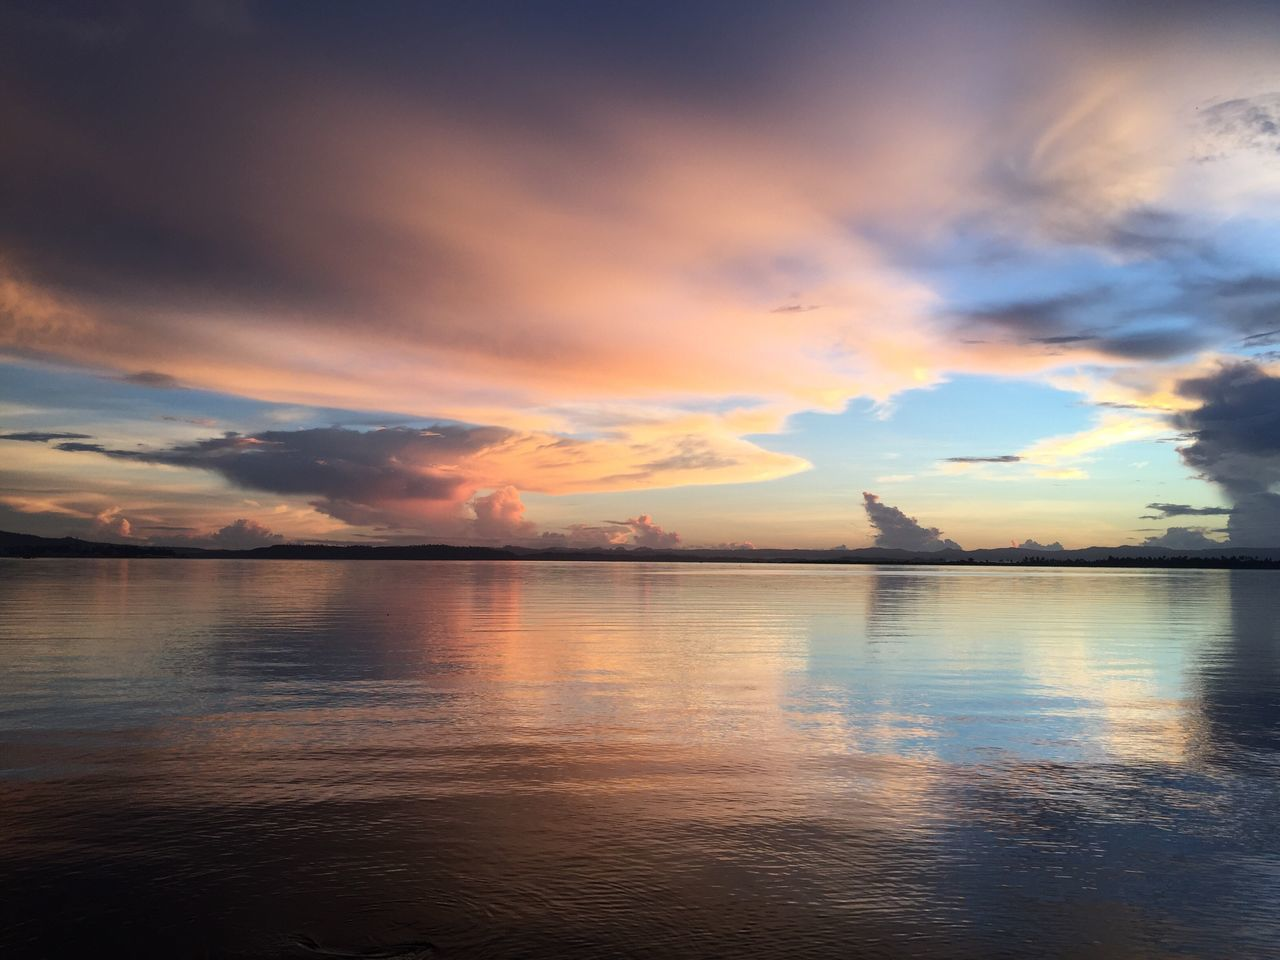 June 24, 2016. No filter sky over Cancabato Bay.